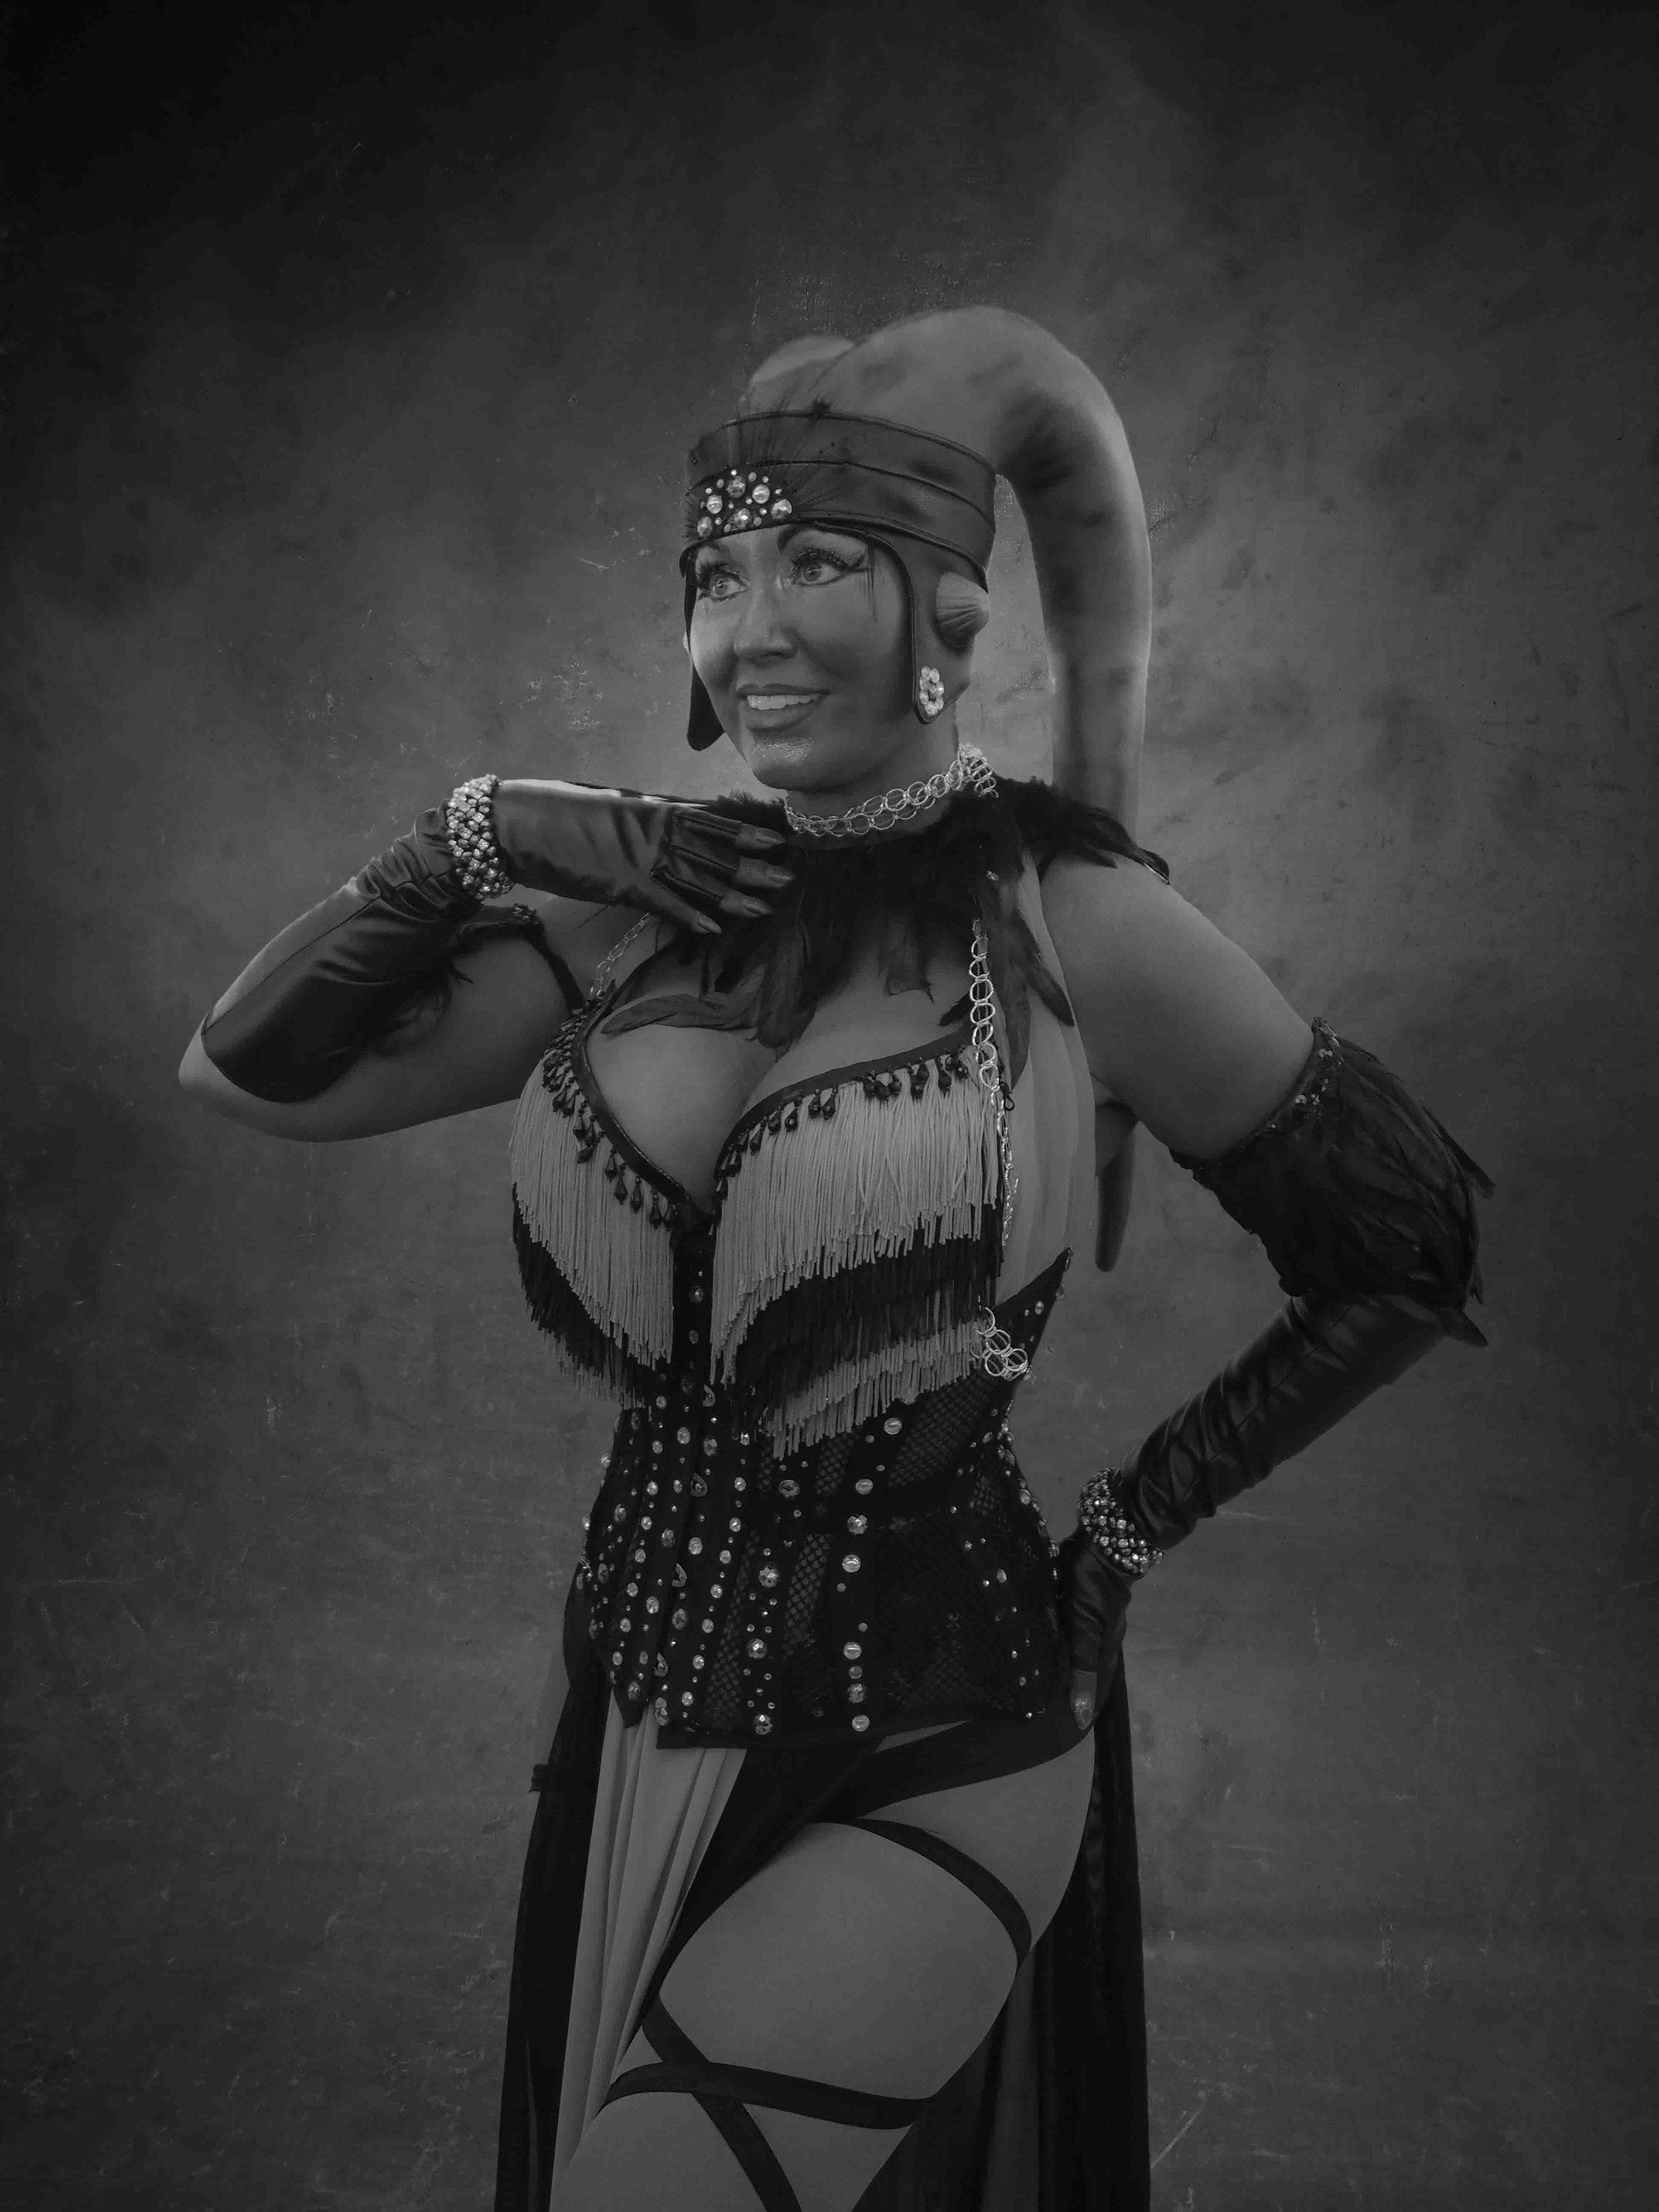 Twilek Jedi Dancer - Inspired by Star WarsCOSPLAY BY | Go-Go Incognito